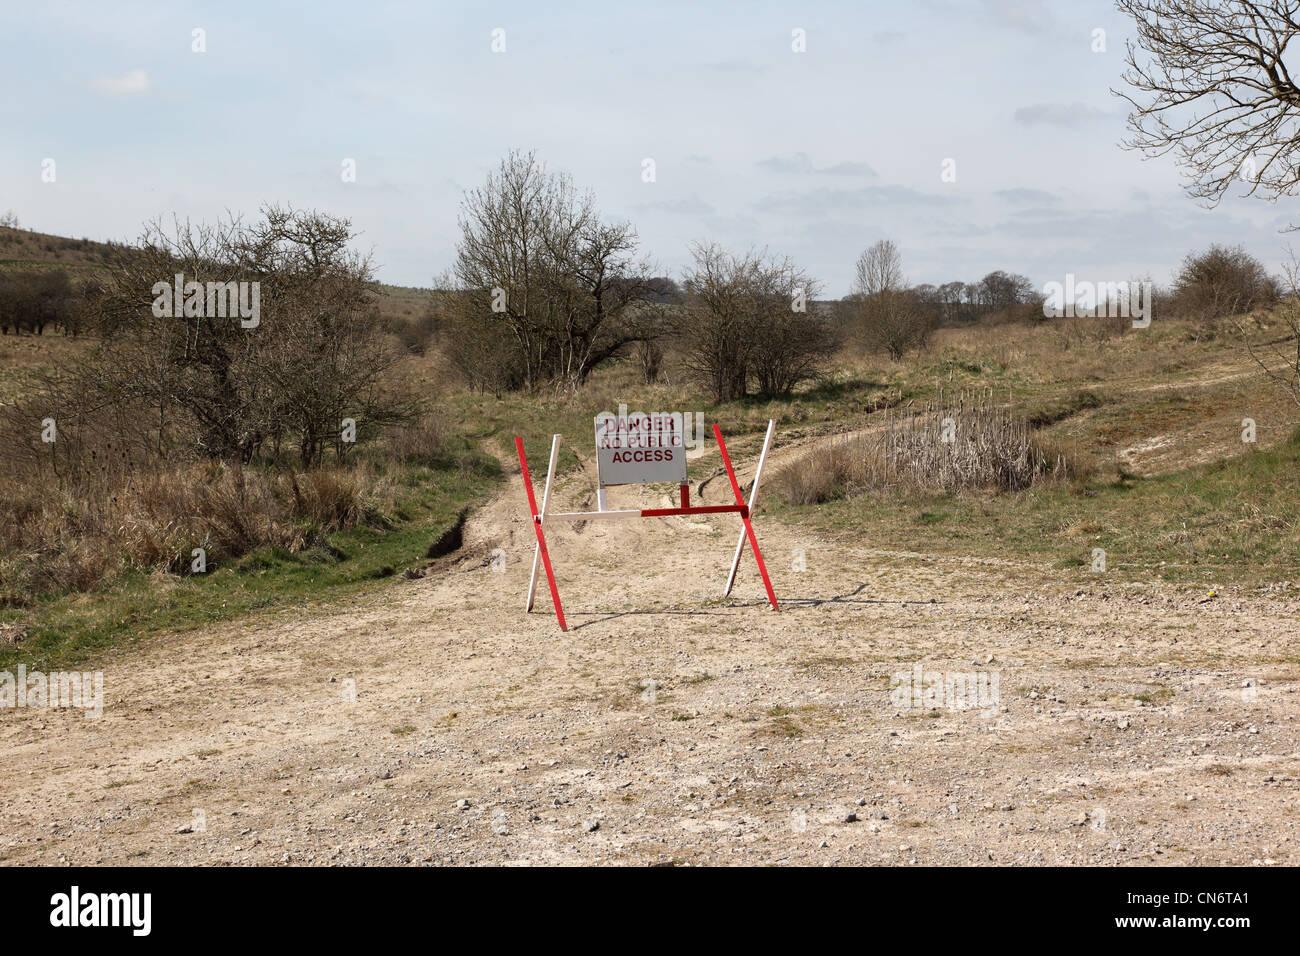 Salisbury Plain British Army training ground, Wiltshire, England - Stock Image